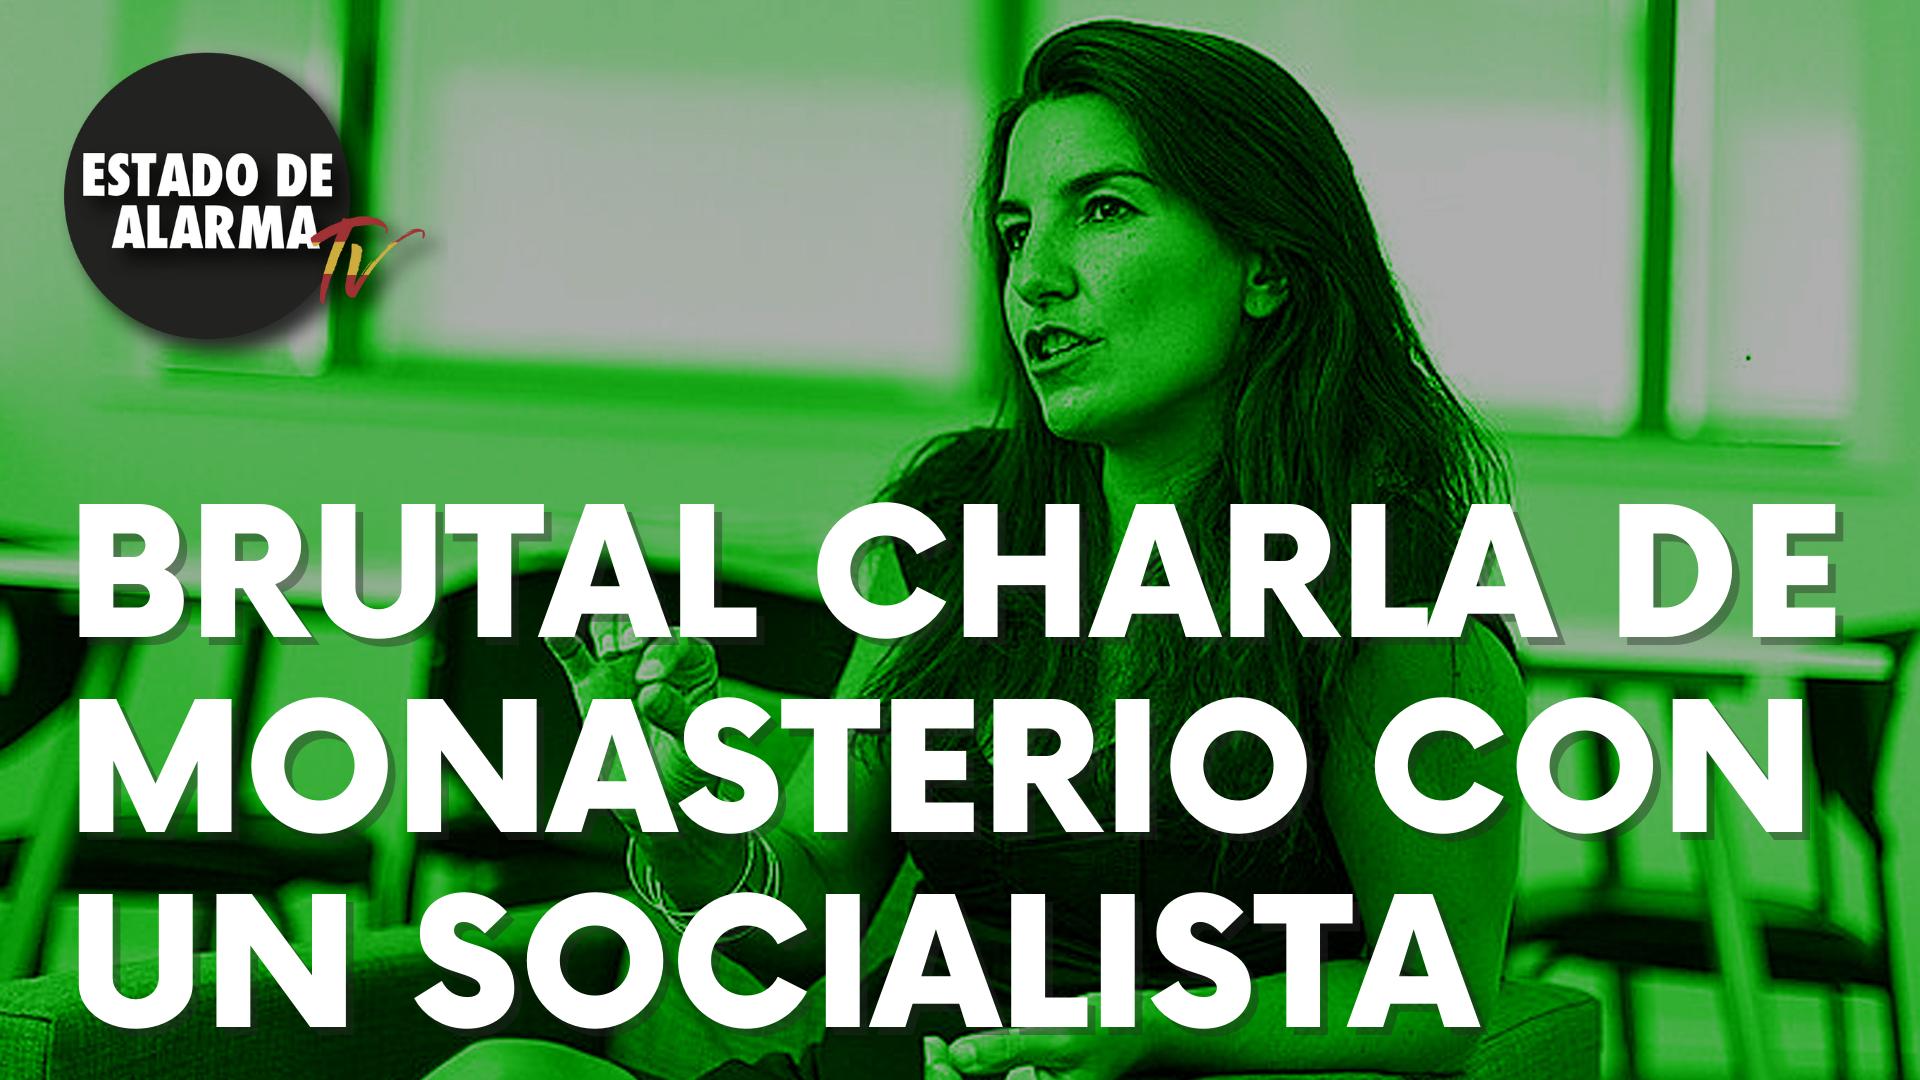 "Brutal conversación que Rocío Monasterio con un socialista: ""¡Gracias por invitarme al café!"""